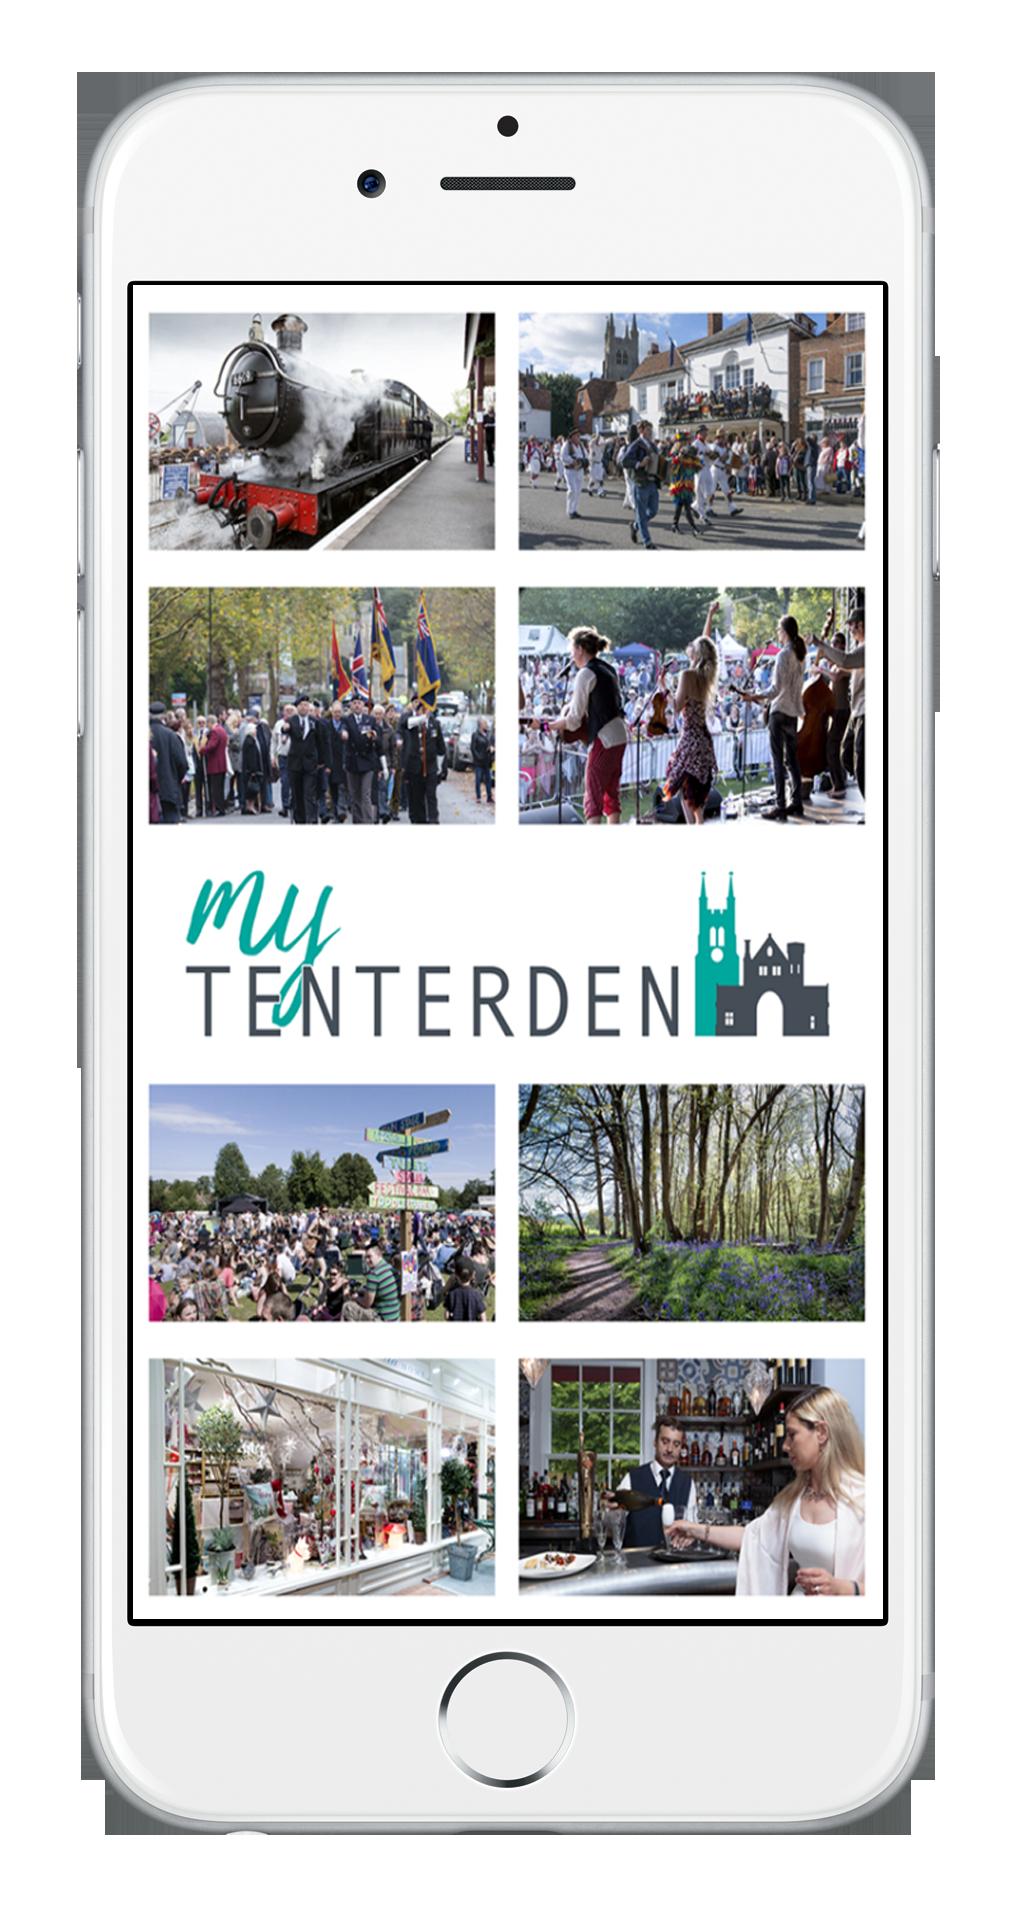 Explore TENTERDEN like a local.